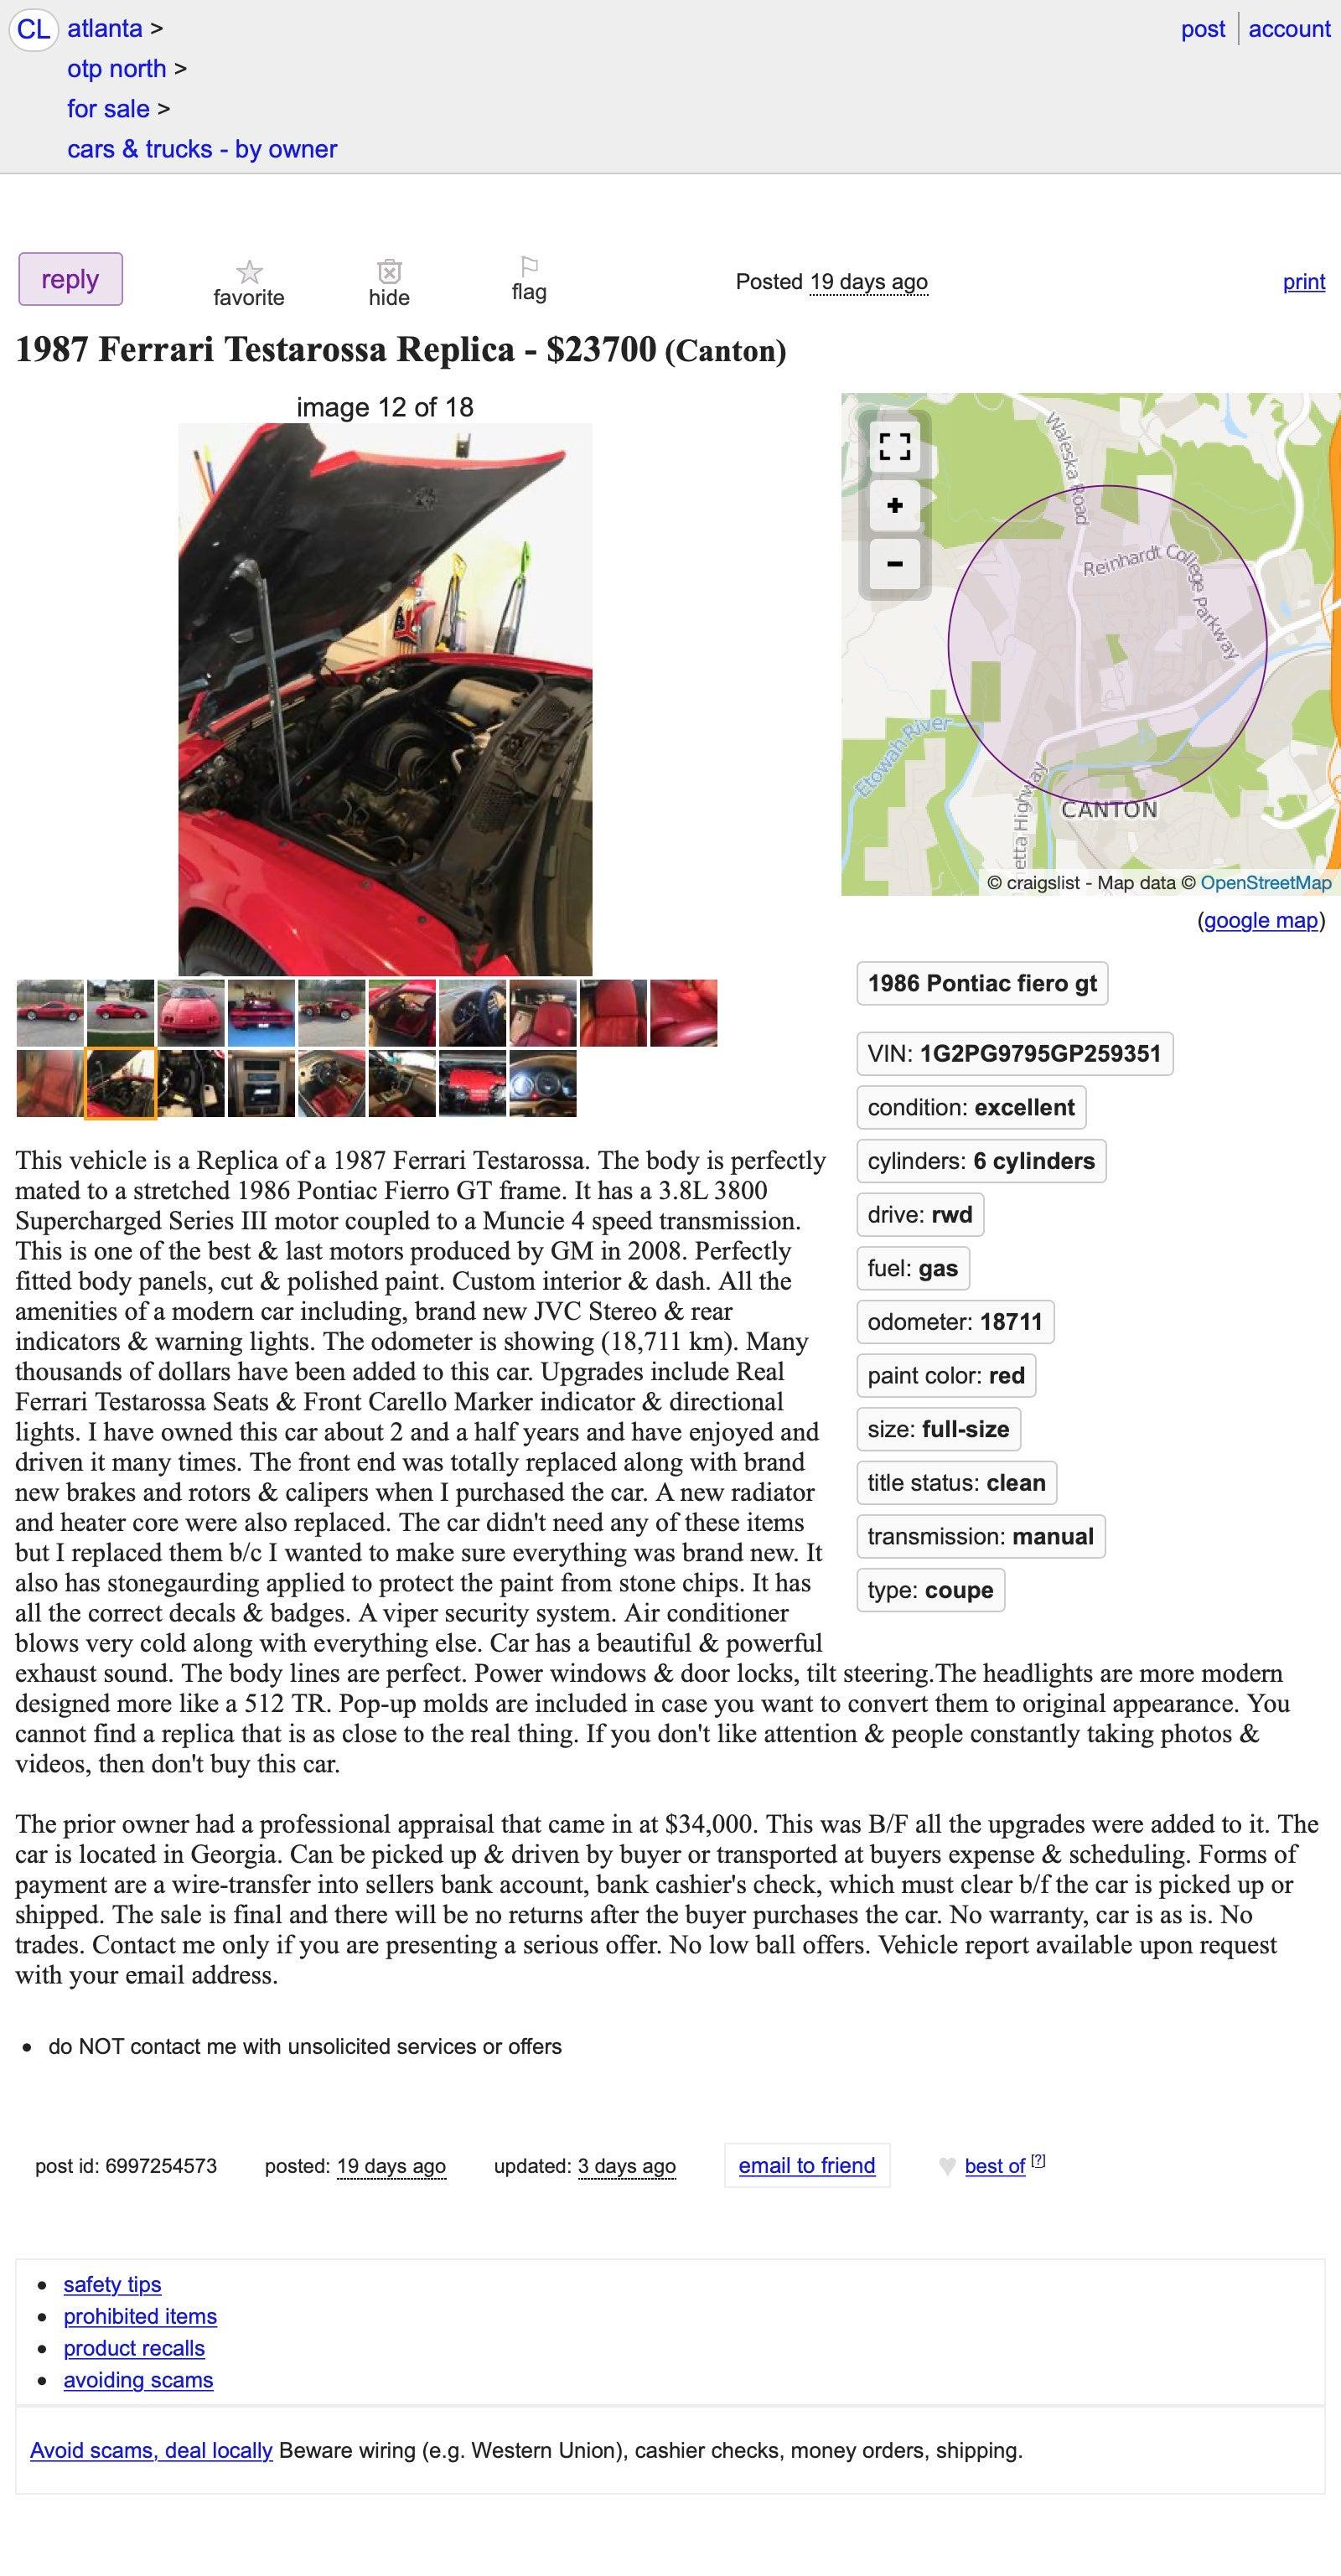 At $23,700, Could This 1987 Ferrari Testarossa Replica Be